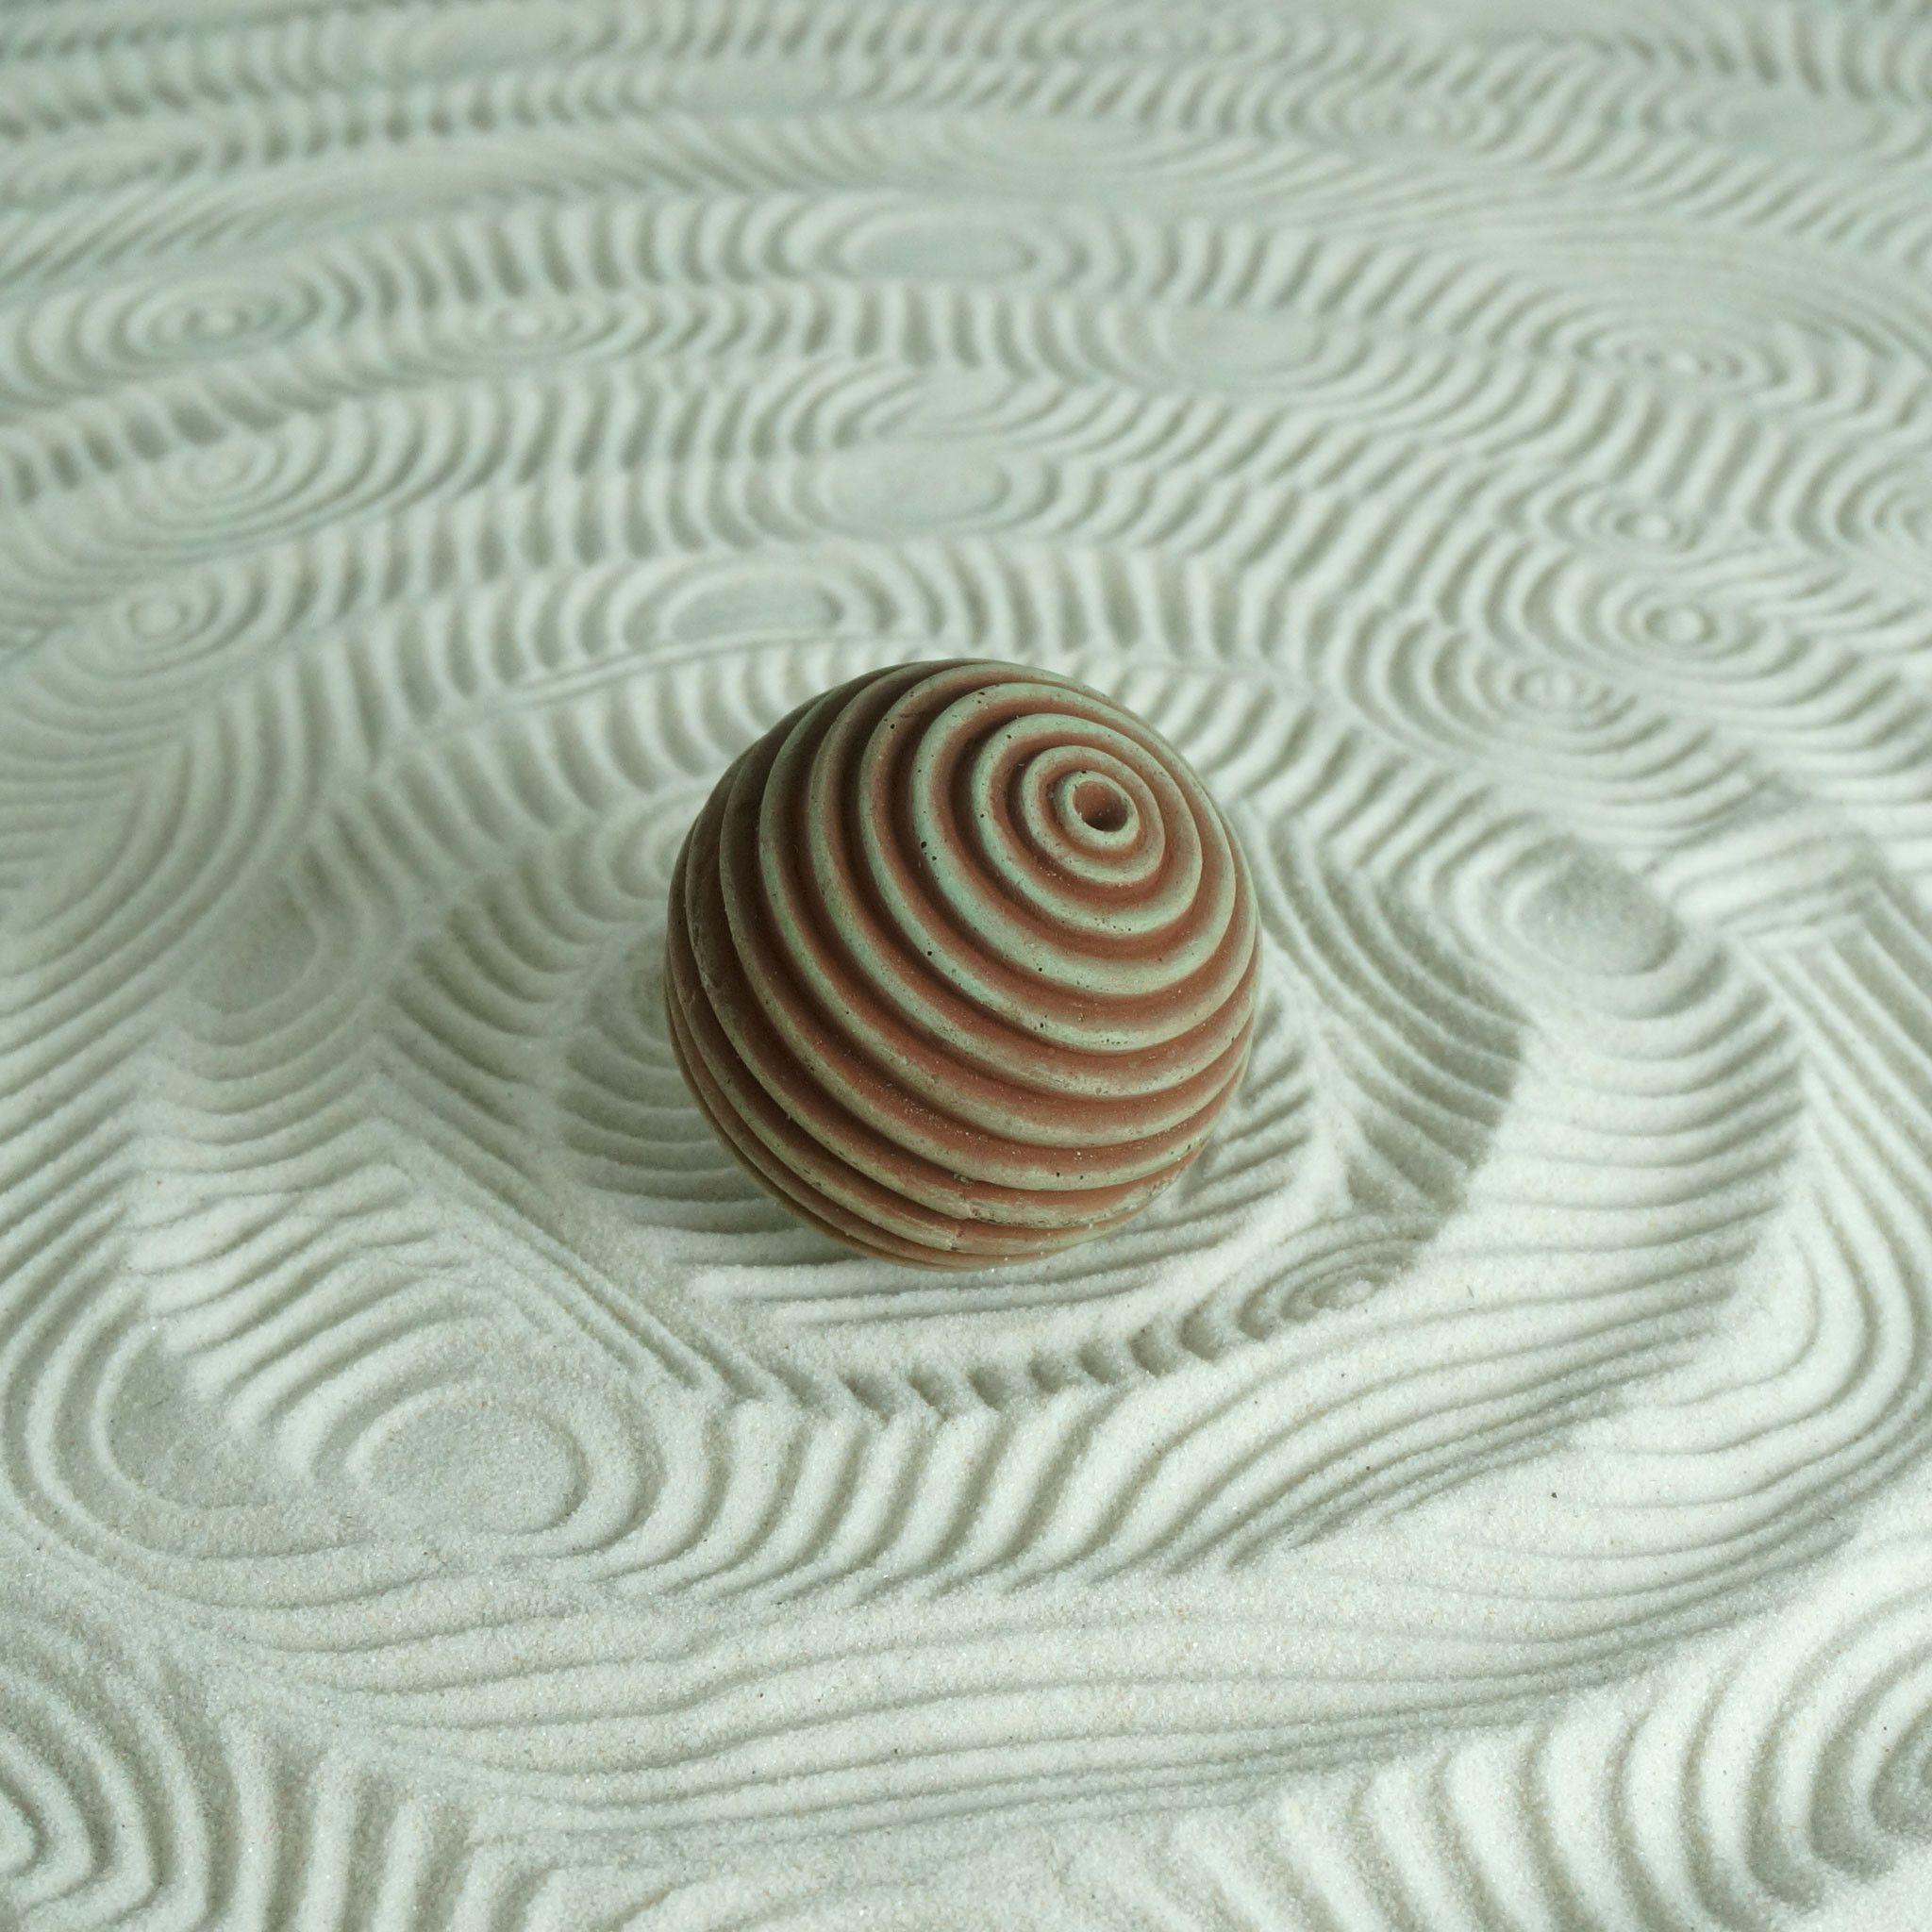 Textured Zen Garden Ball Medium Lines Design Zen Garden